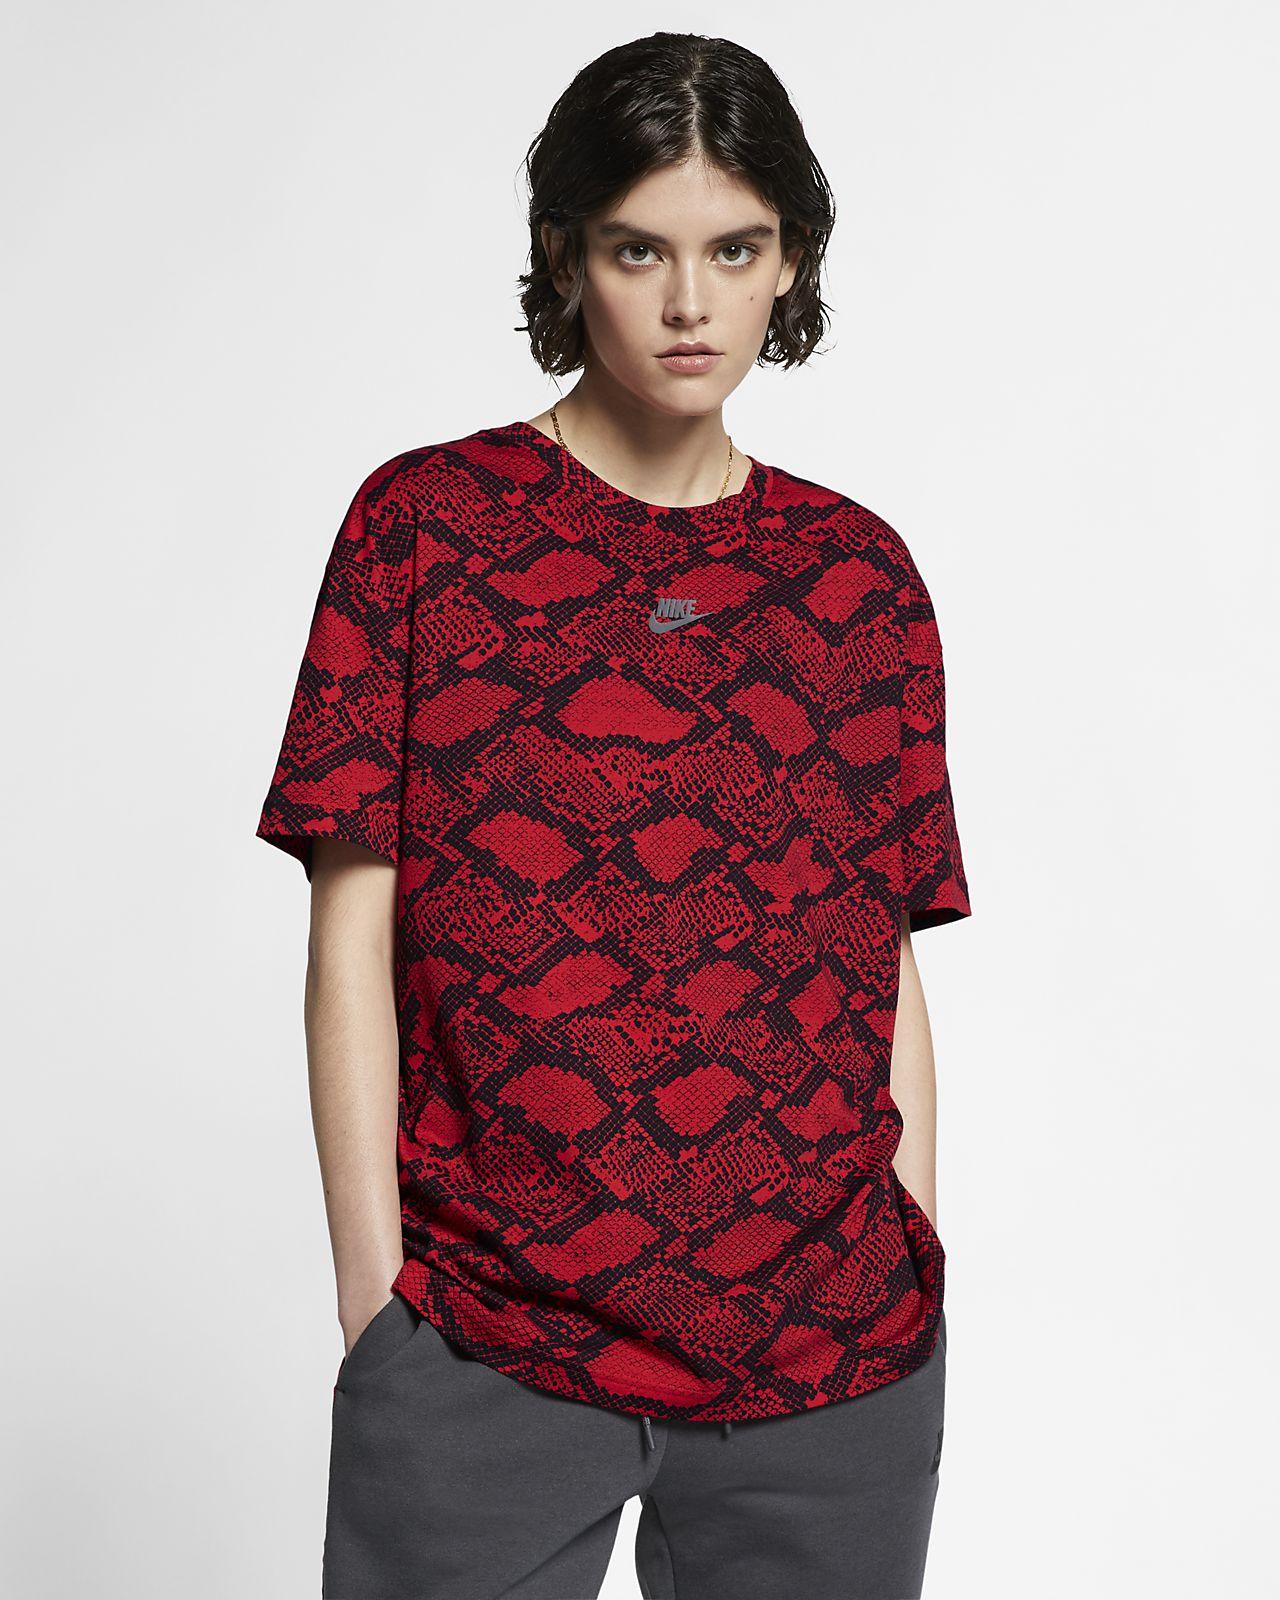 Tee-shirt à imprimé animal Nike Sportswear pour Femme